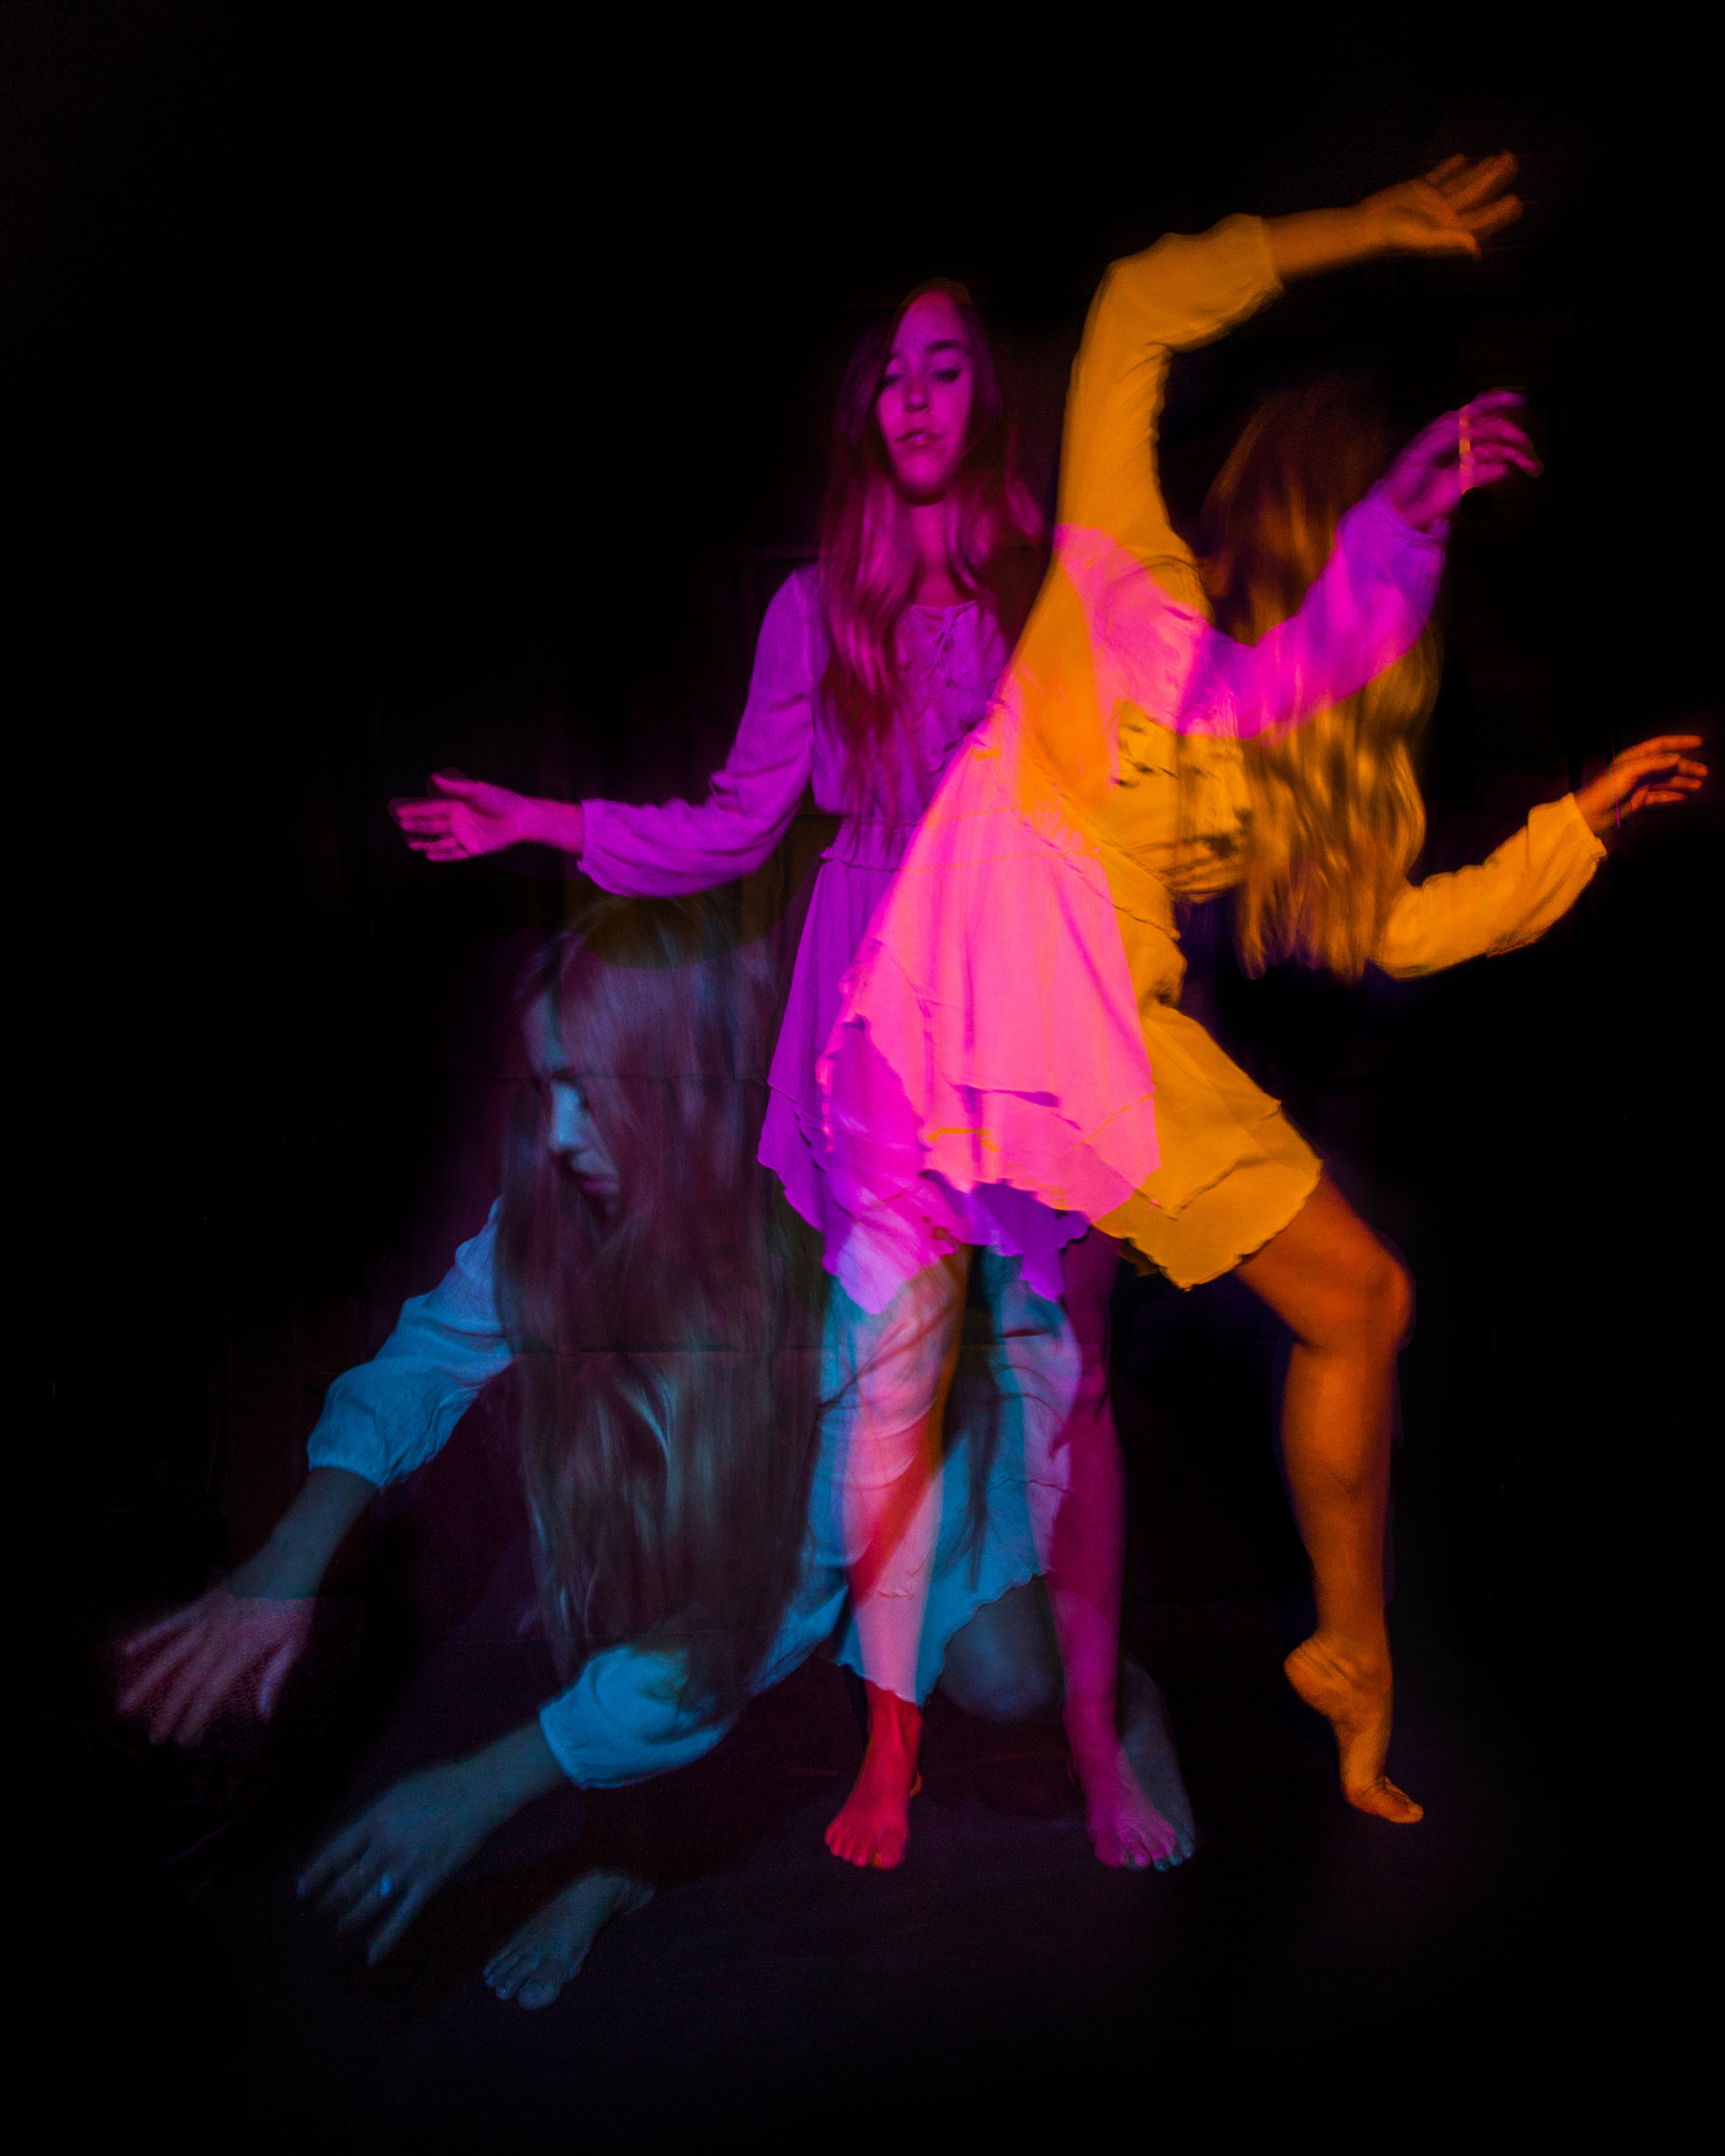 JordanRose_DarrenPearson_AstroBandit_DariusTwin_lightpainting_psychedelic_dancer_2.jpg